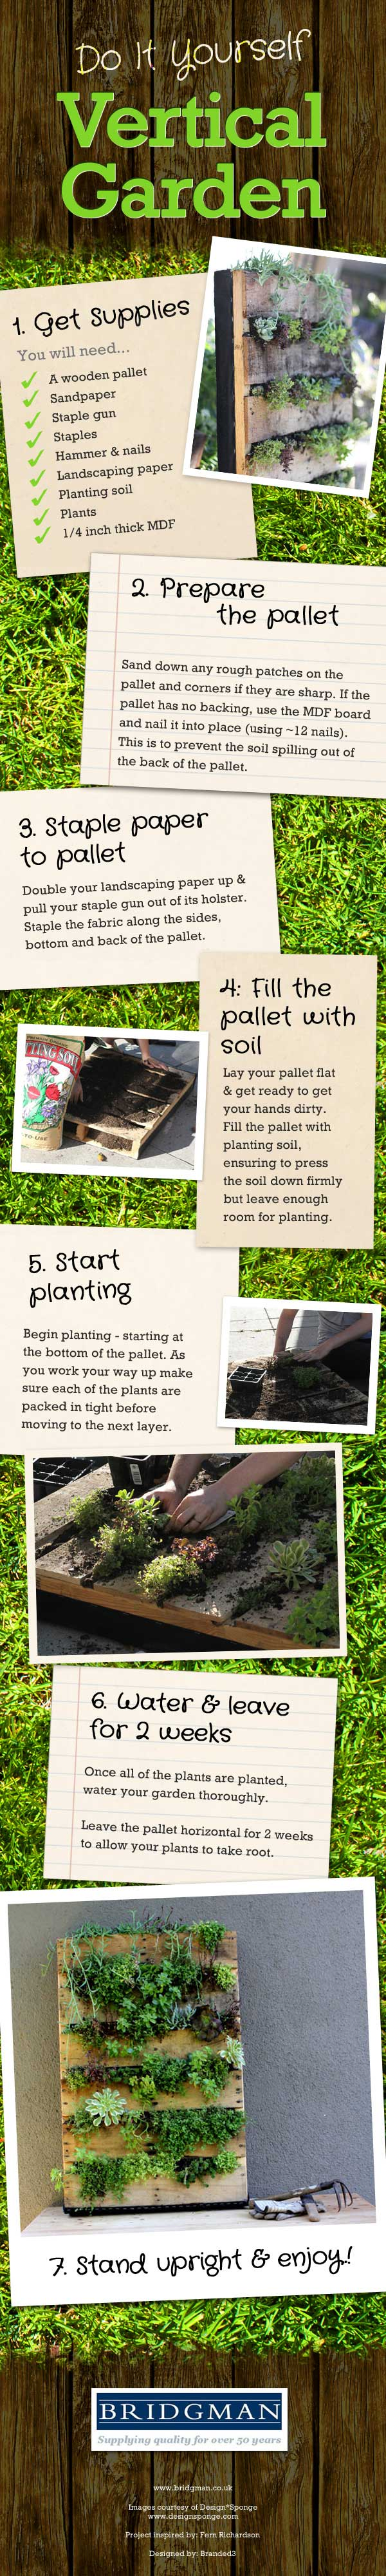 Do It Yourself Vertical Garden!